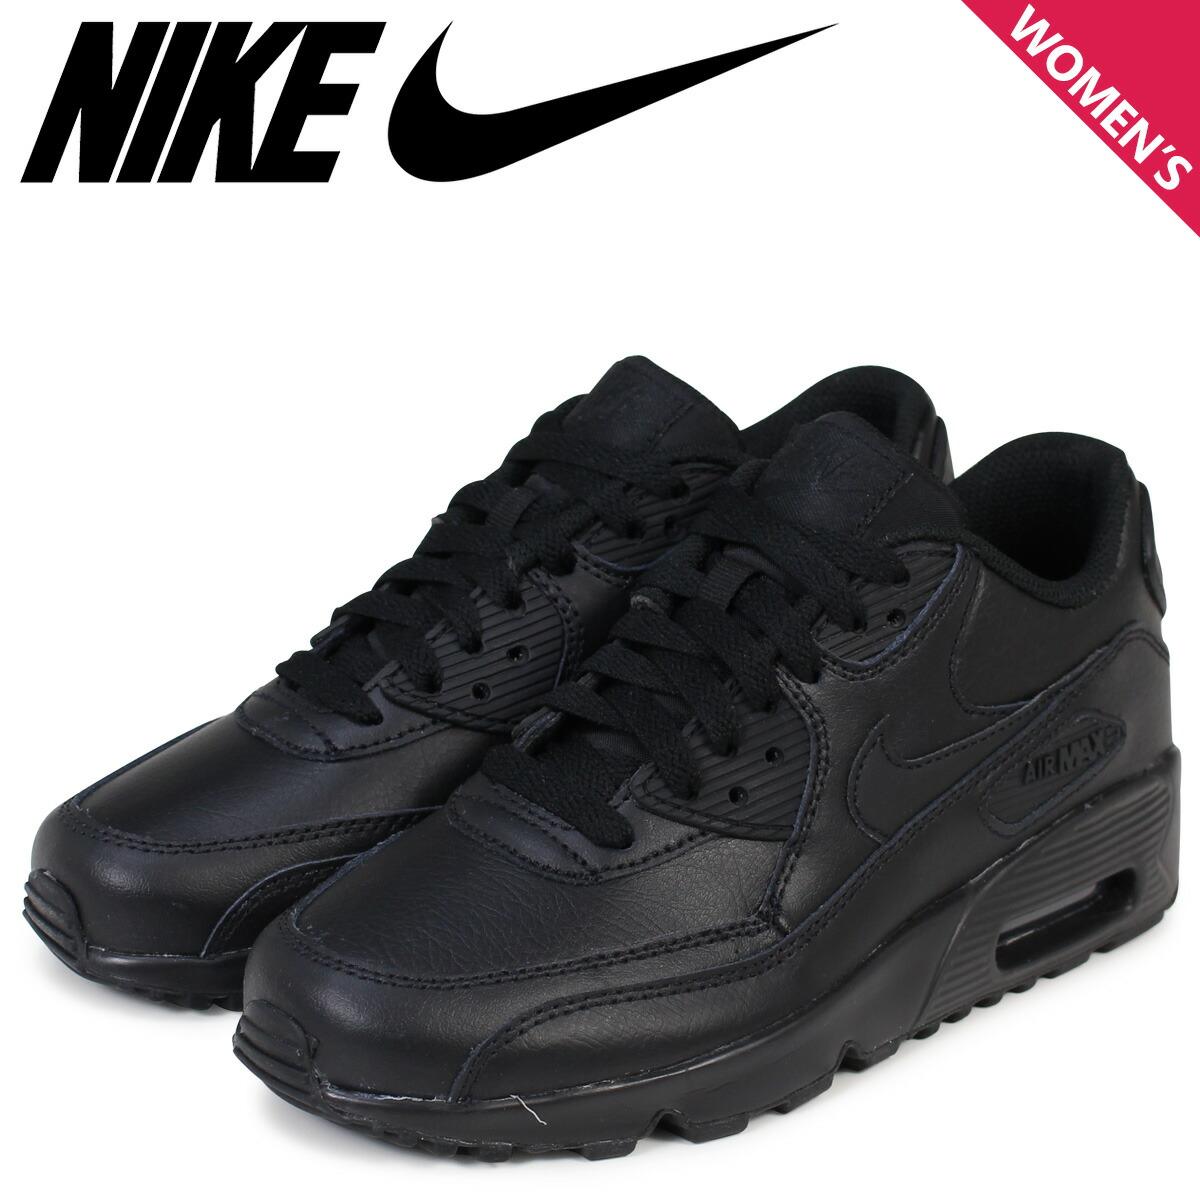 nike shoes air max black 90